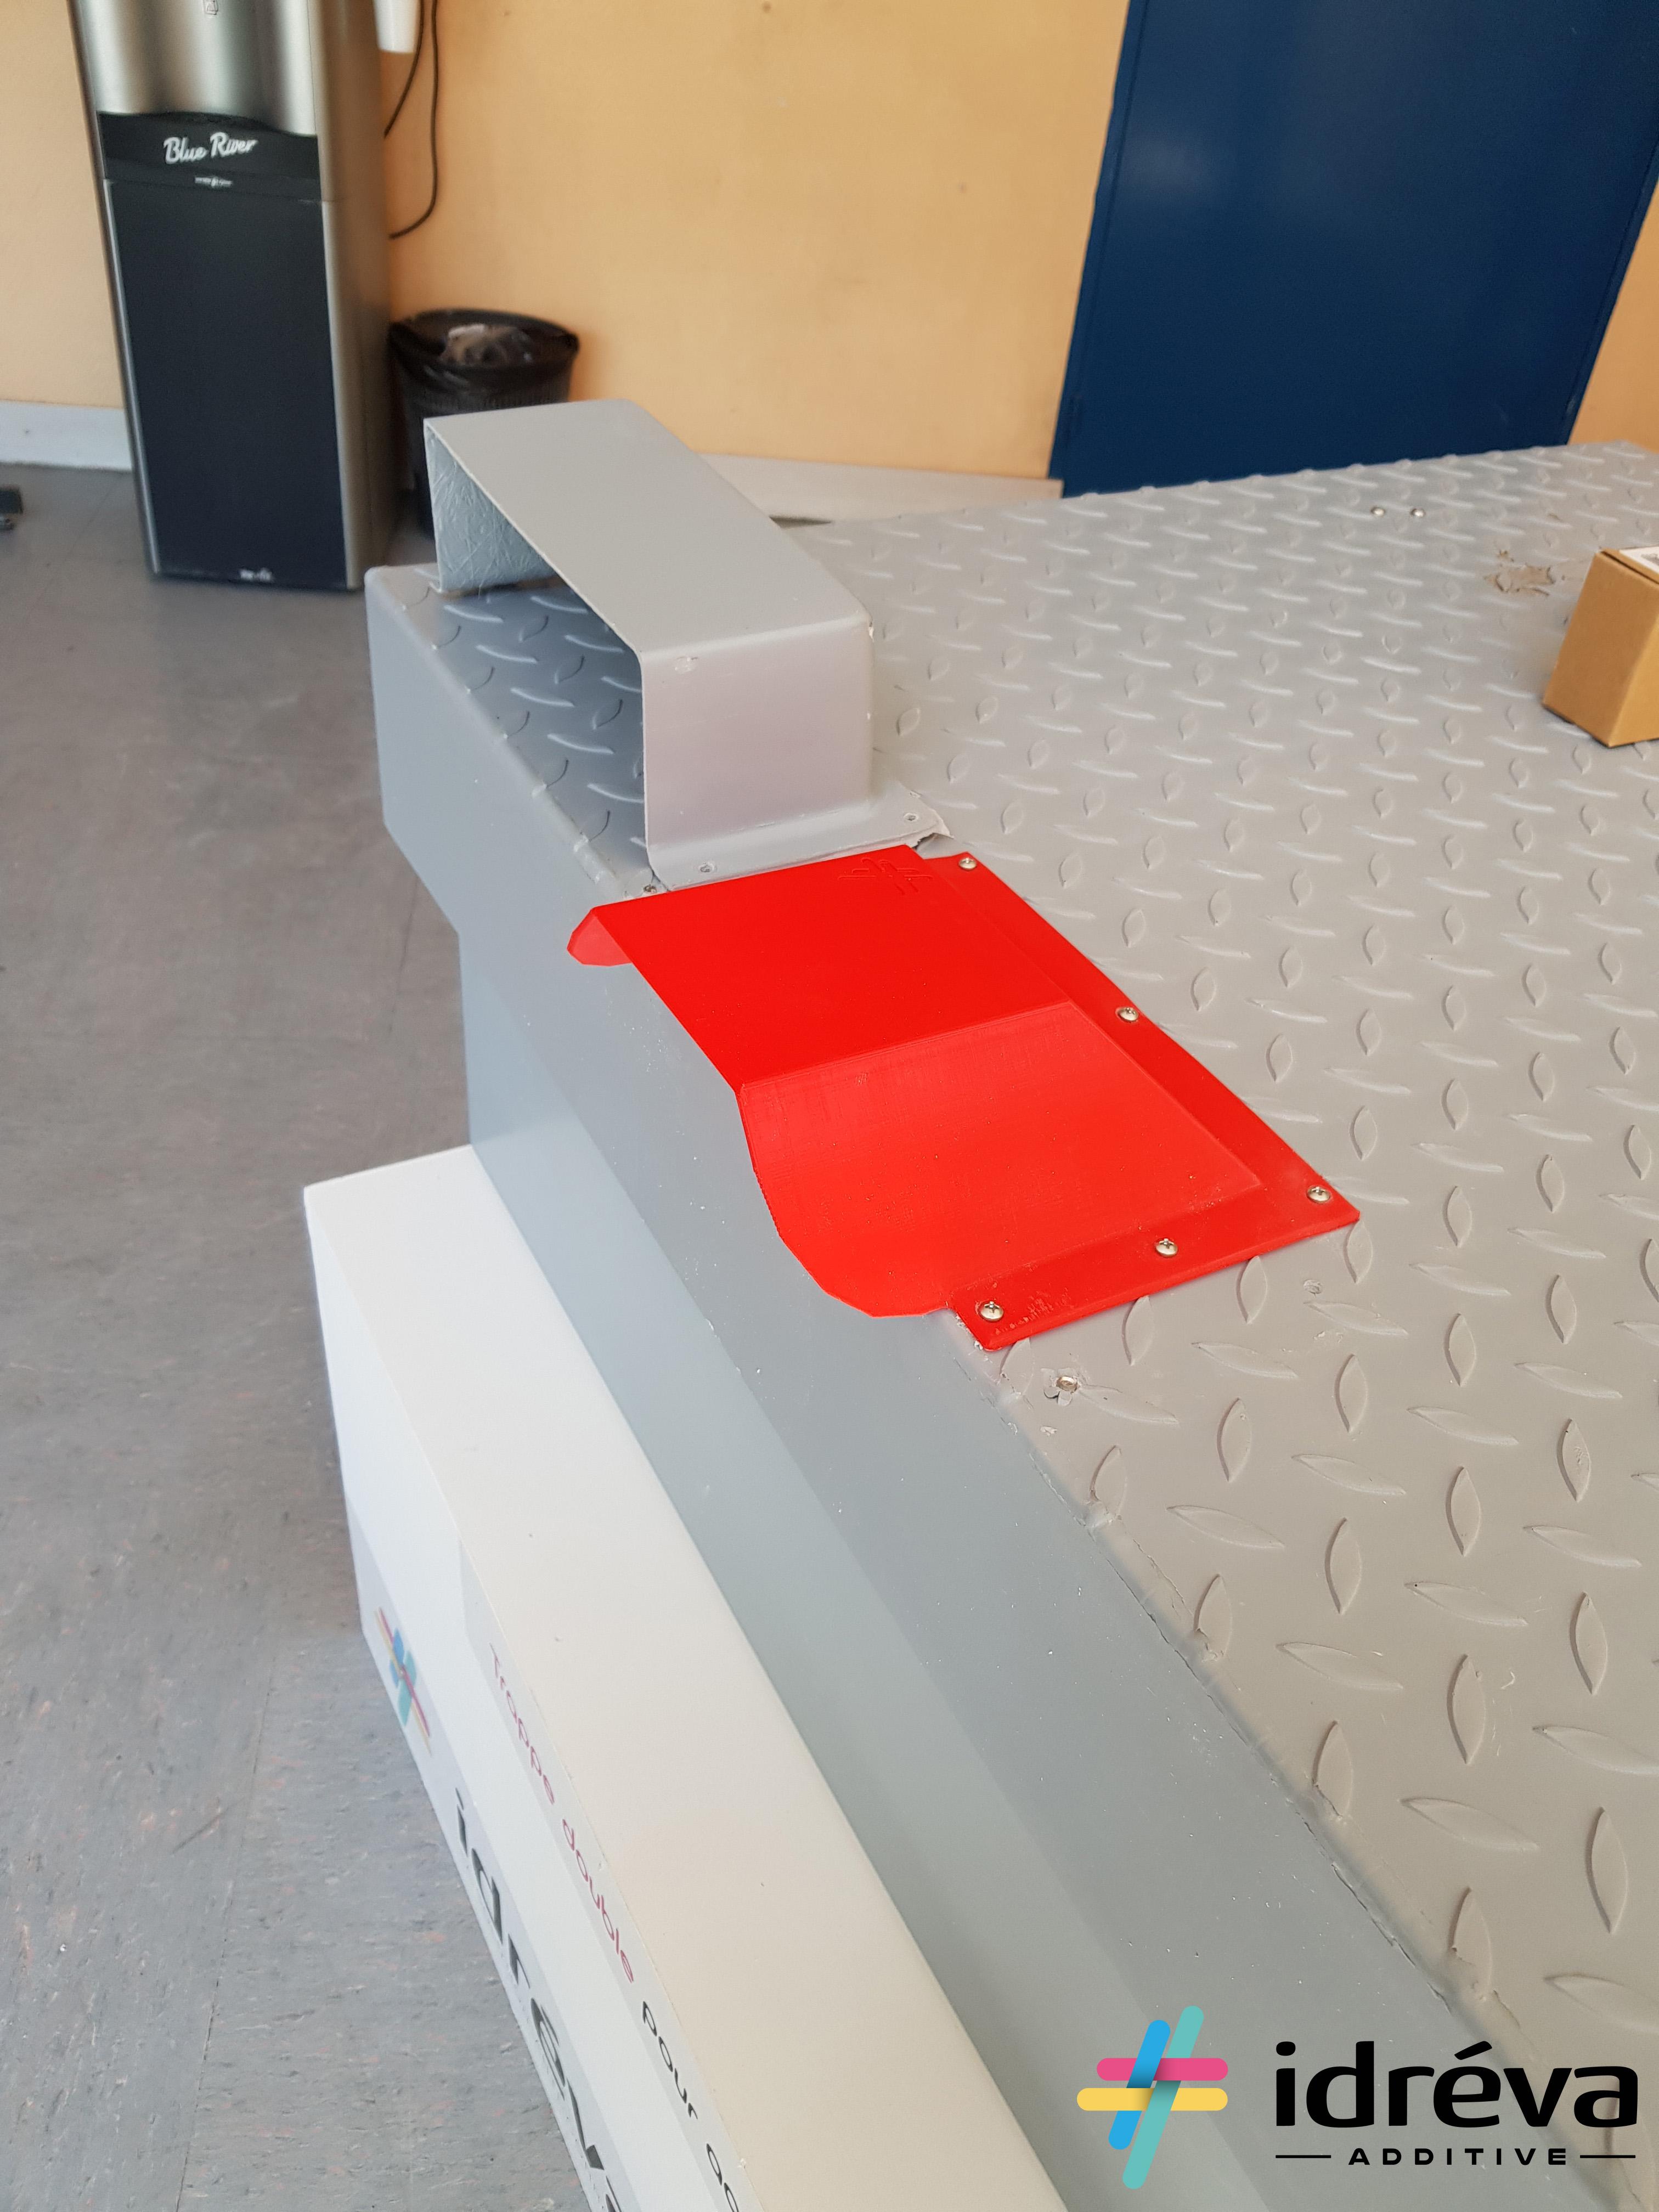 Impression 3D Idreva